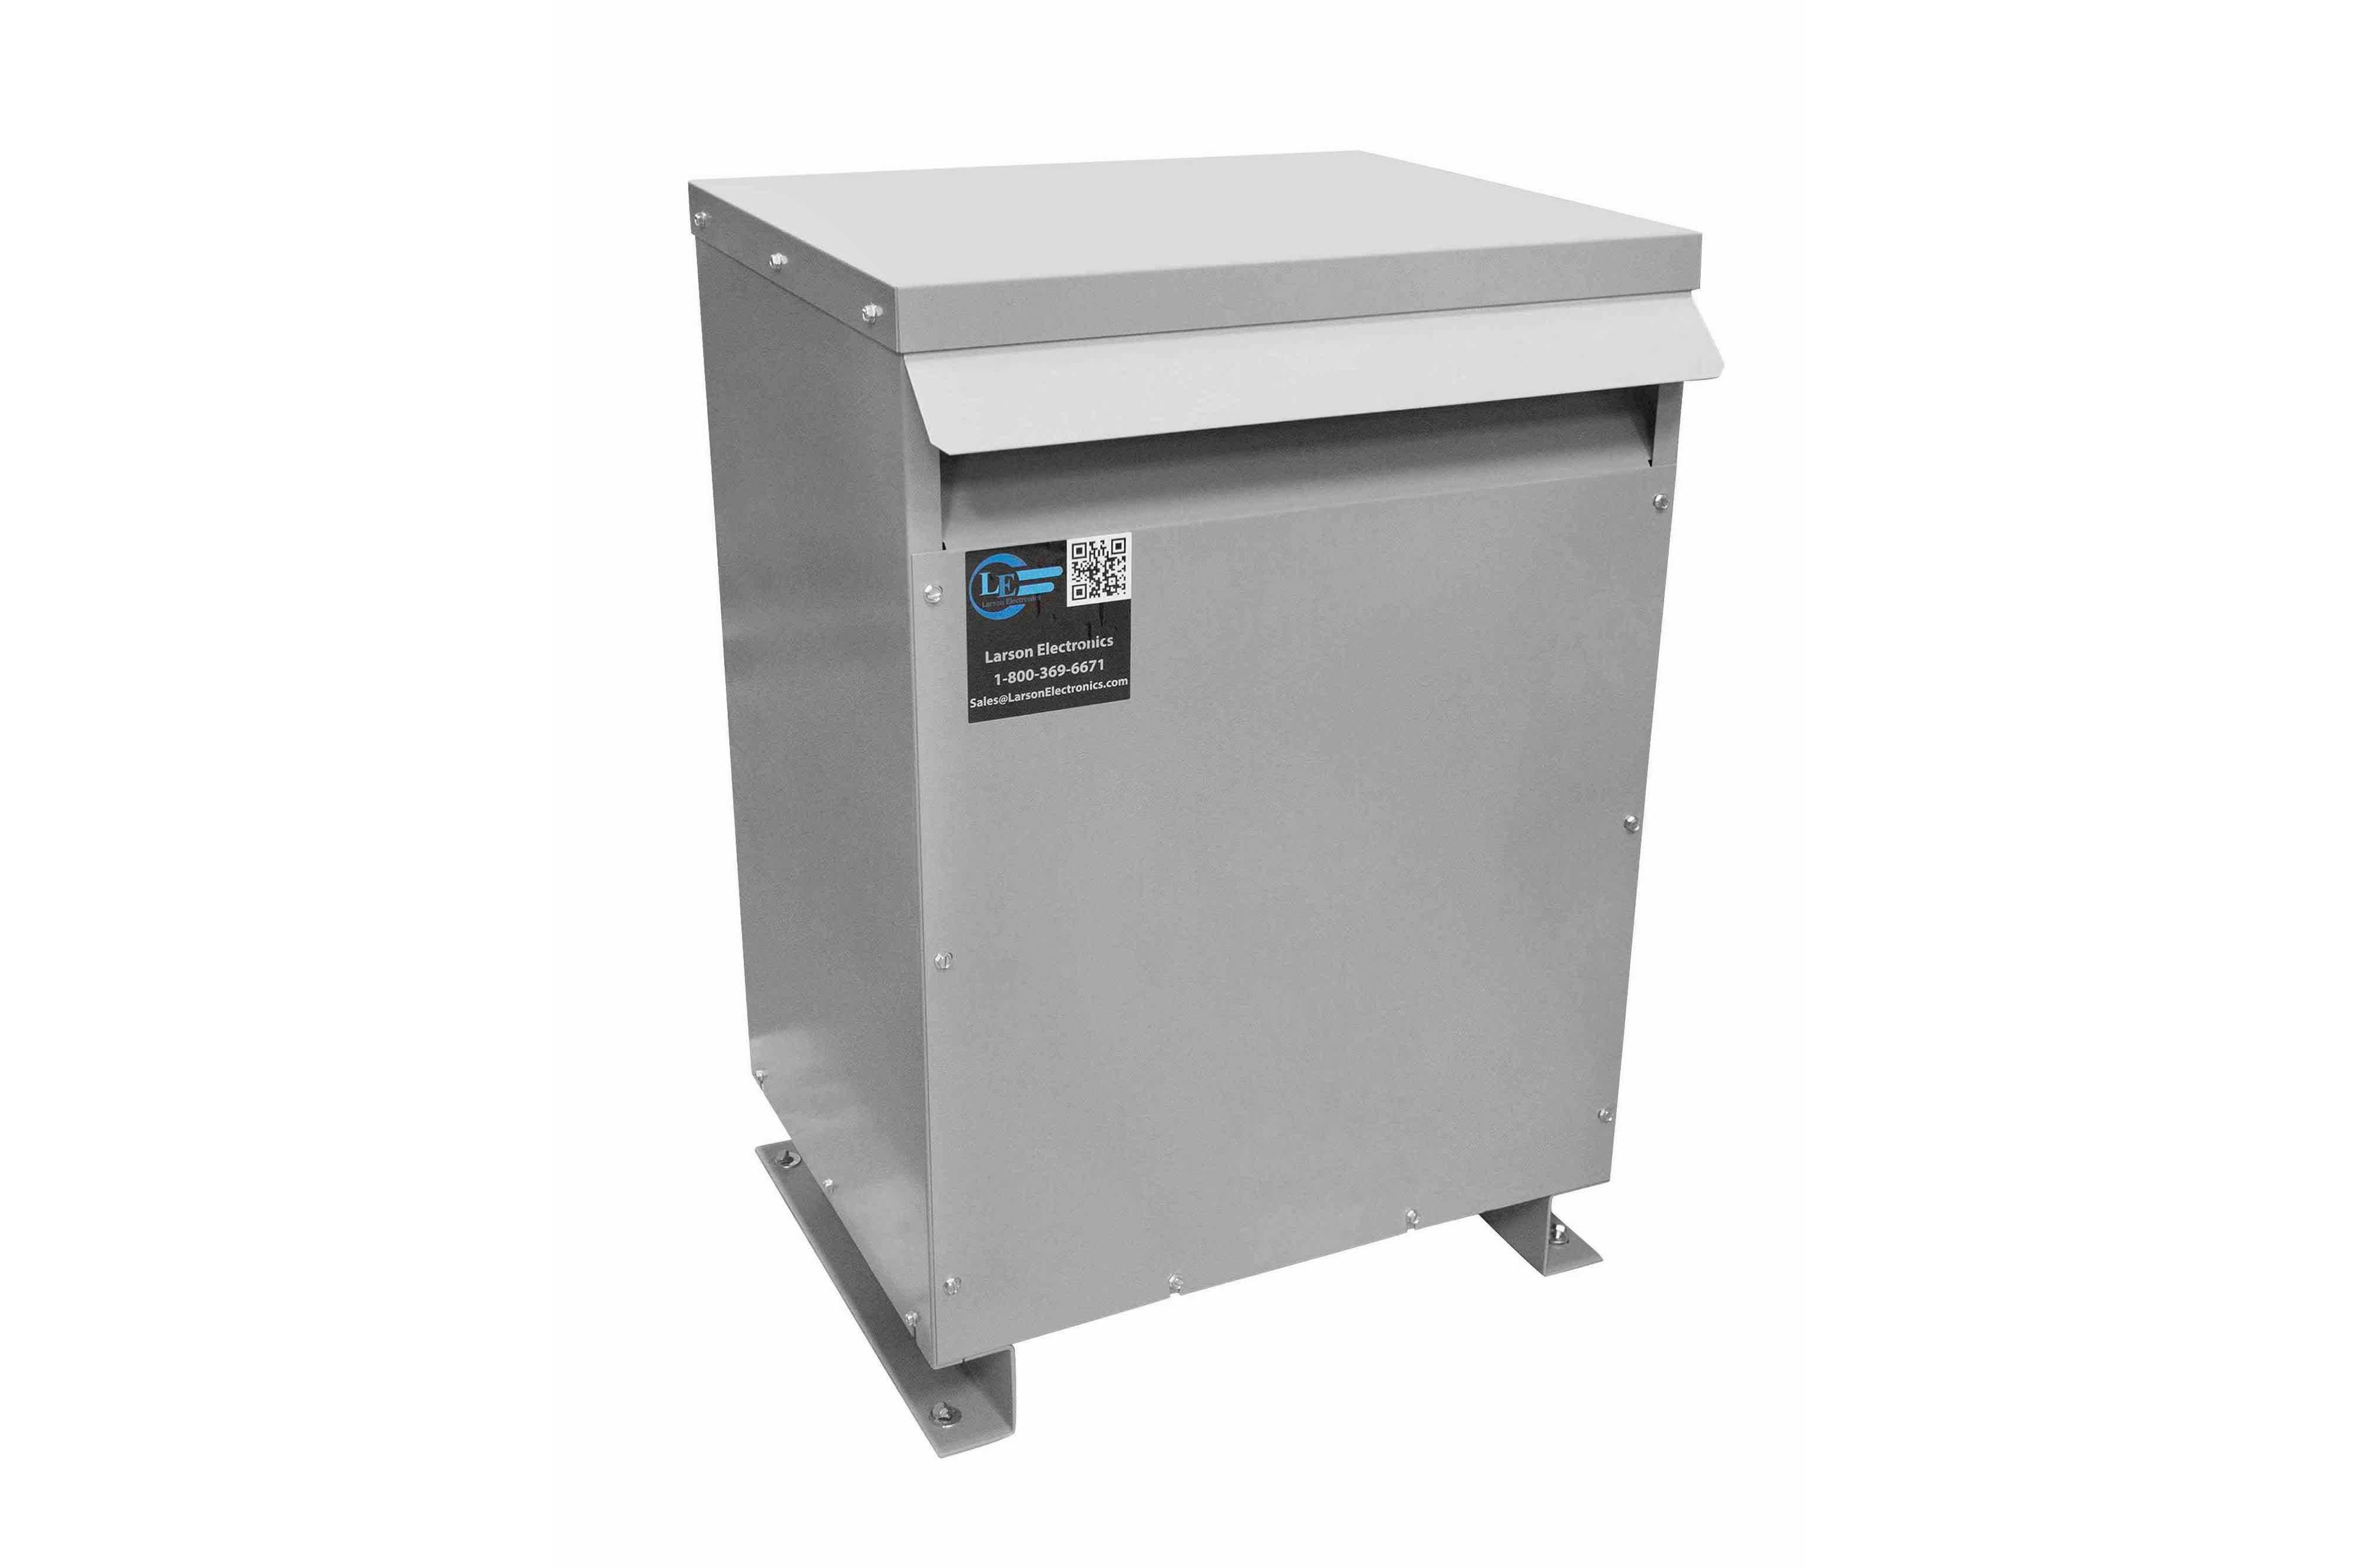 37.5 kVA 3PH Isolation Transformer, 600V Wye Primary, 400V Delta Secondary, N3R, Ventilated, 60 Hz